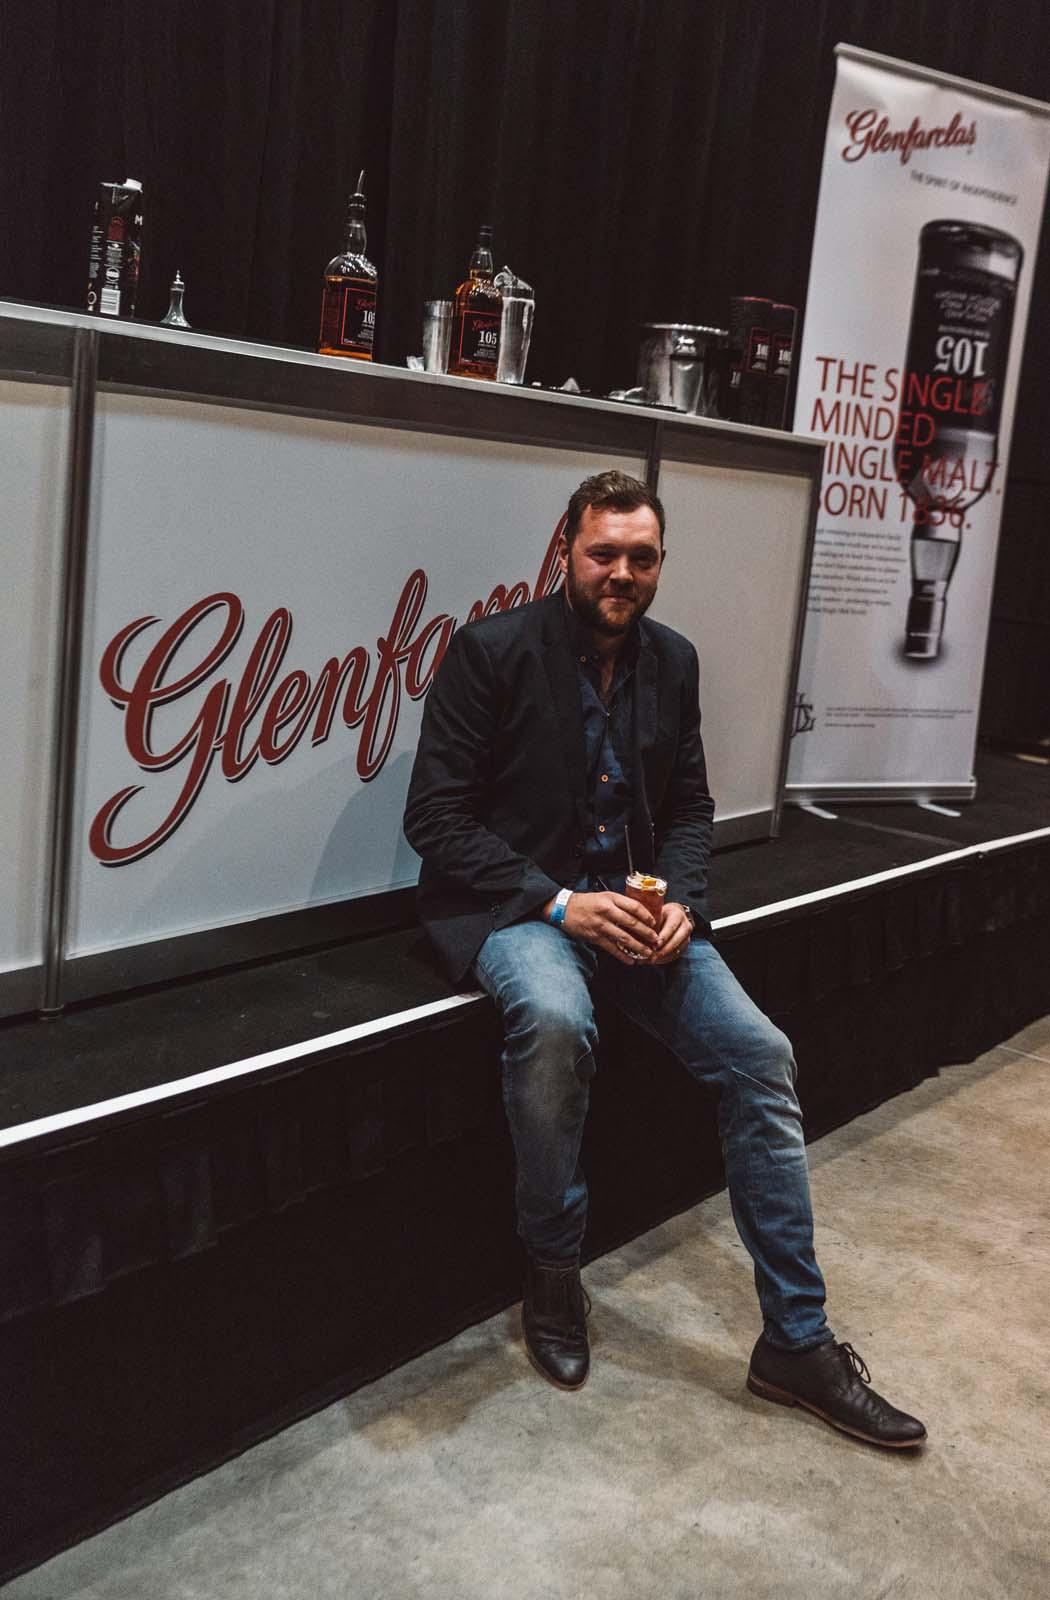 Dramfest 2018 for Whisky Galore-53.jpg